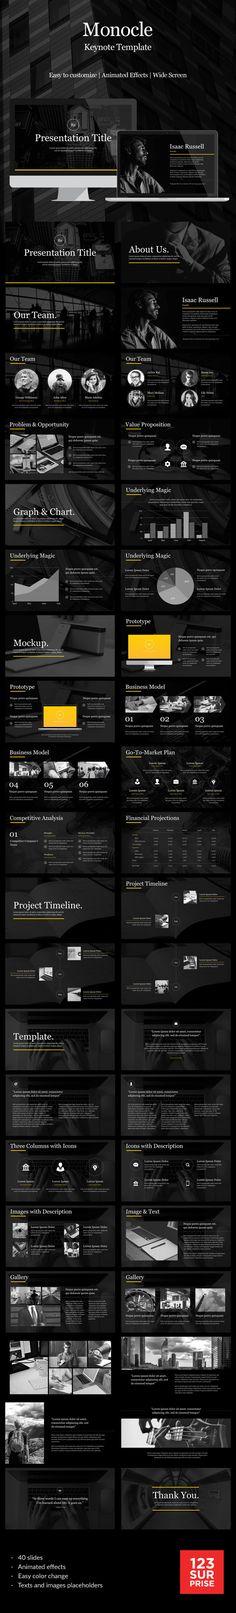 Monocle Keynote Template #design #slides Download: http://graphicriver.net/item/monocle-keynote-template/14365198?ref=ksioks